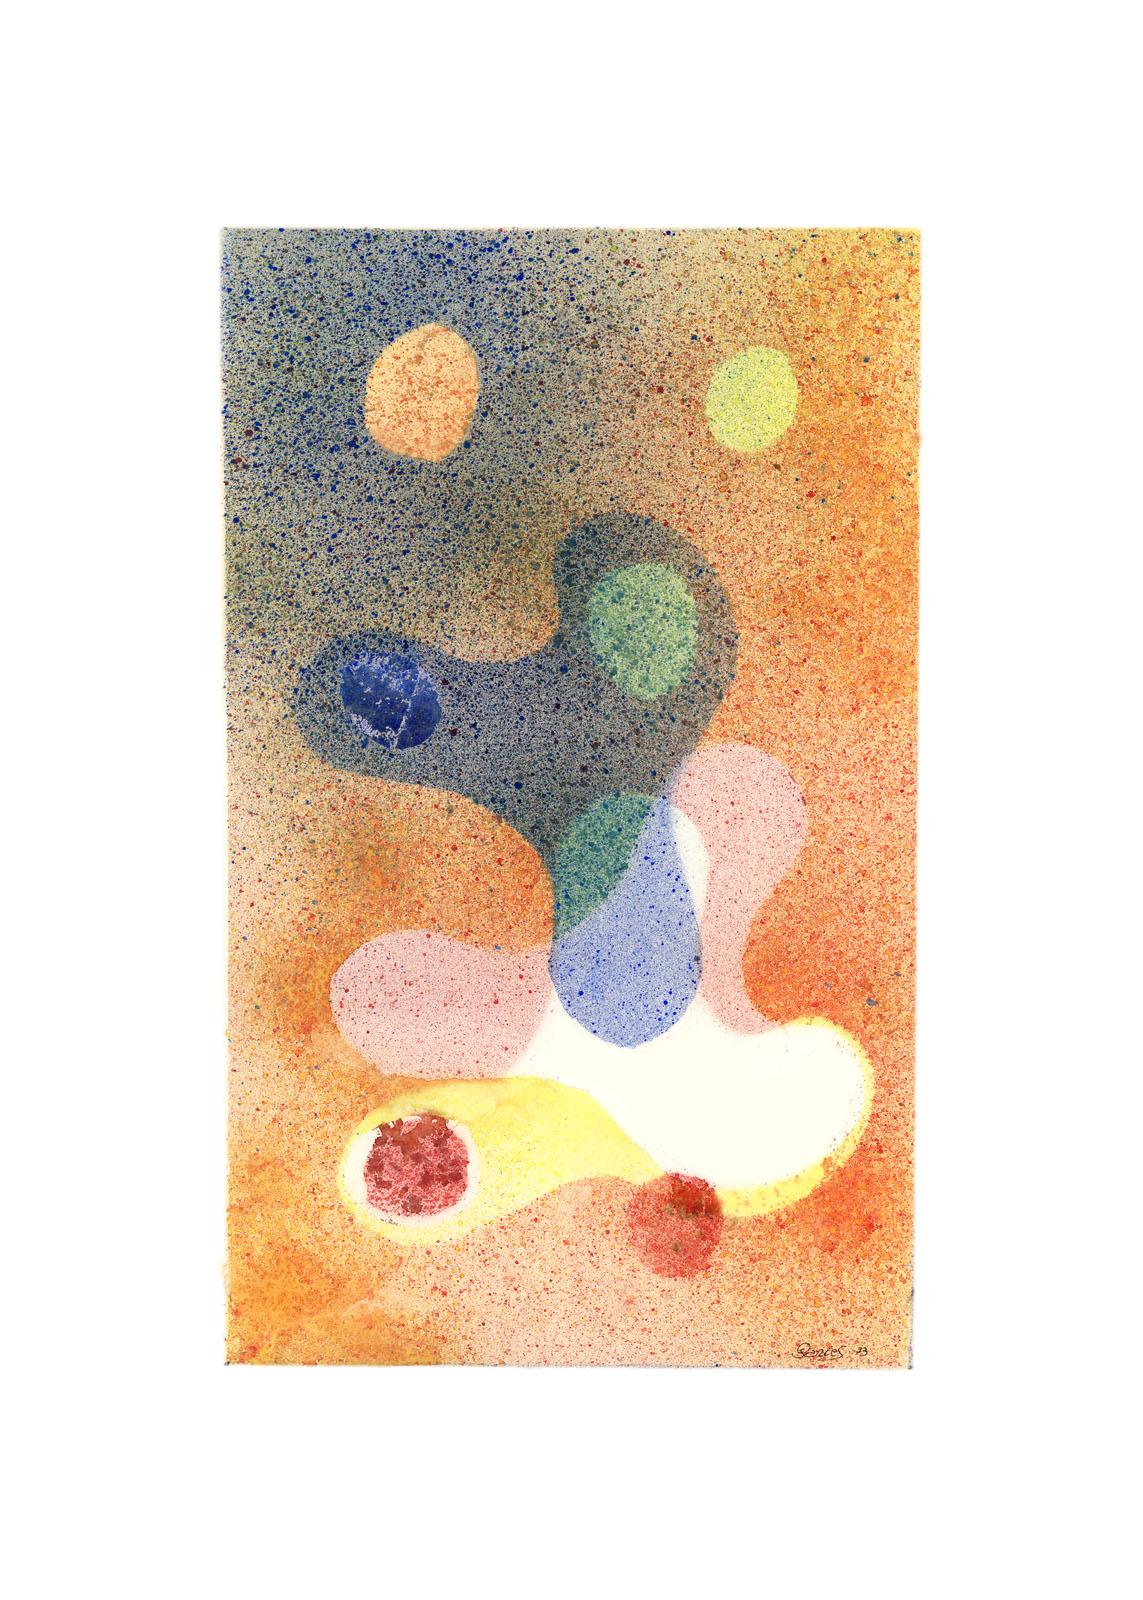 panies-danielvillalobos-spanish-painting-abstract-9